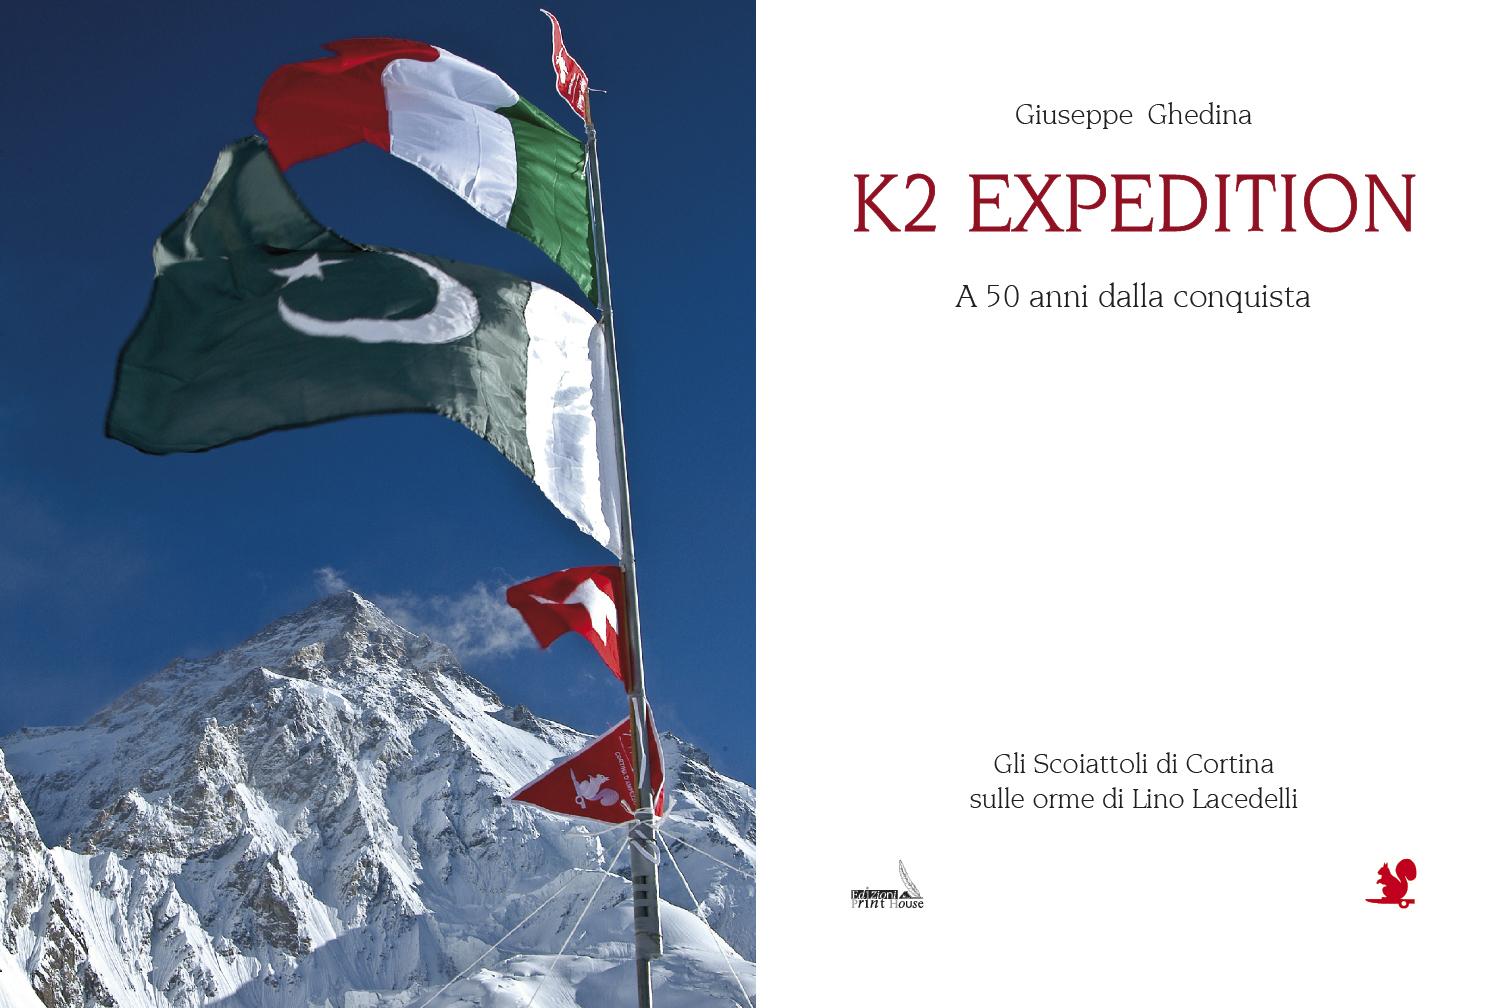 K2 EXPEDITION 1954-2004 Giuseppe Ghedina Fotografo - 003.jpg